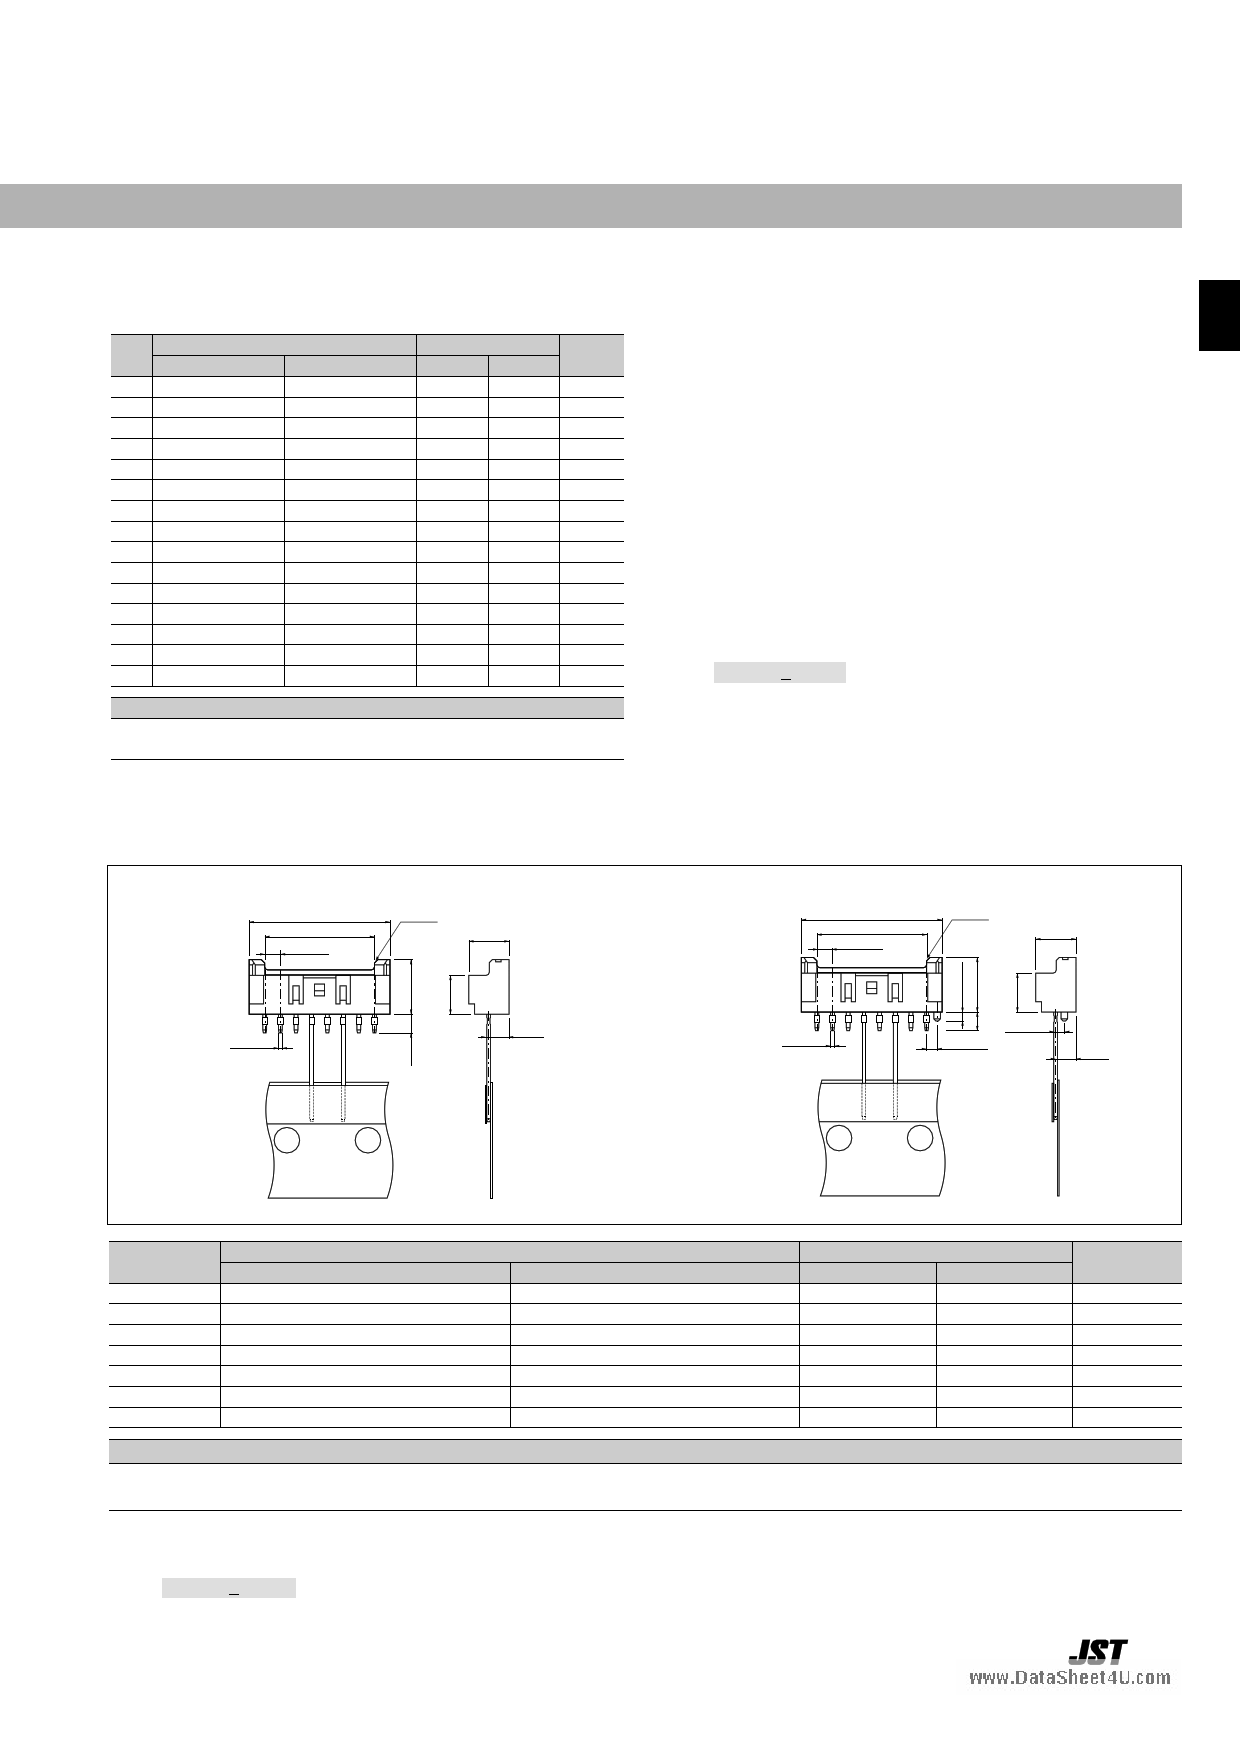 B03B-XASK-1 pdf